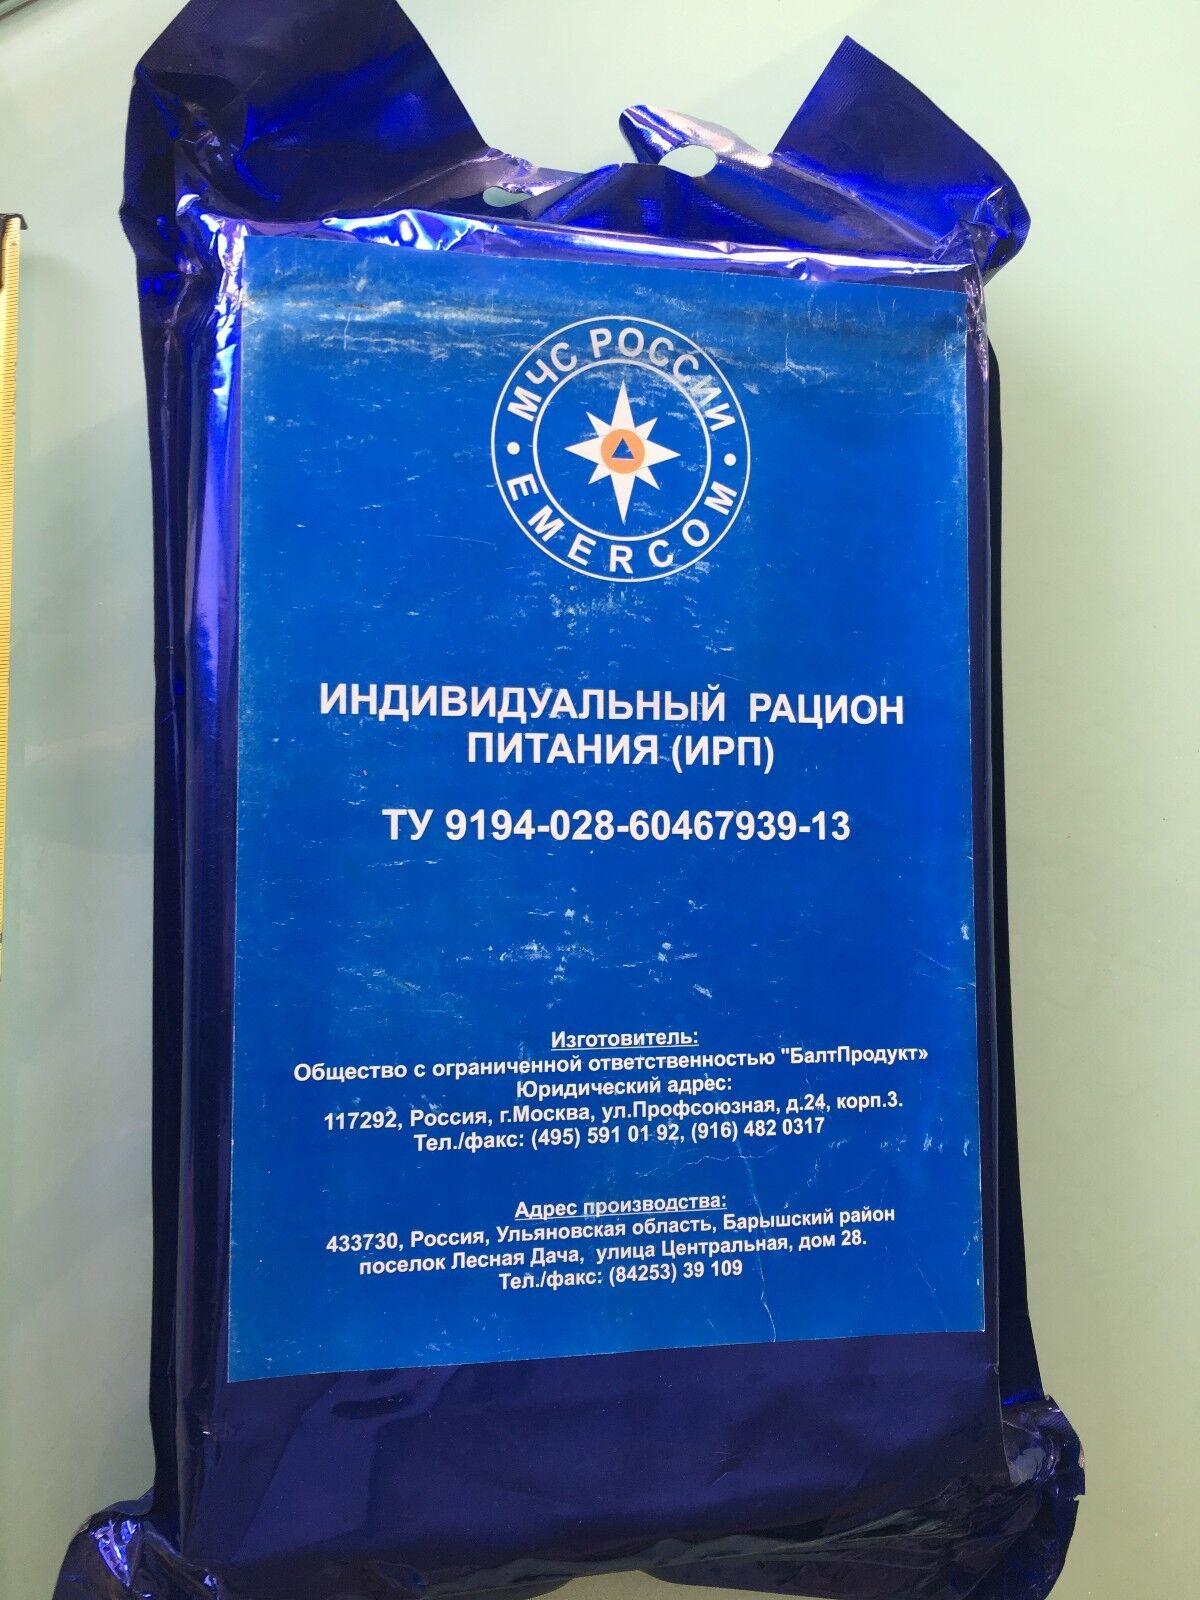 Original mch Rusia Emercom ración individual (IRP) ruso alimentaria de emergencia